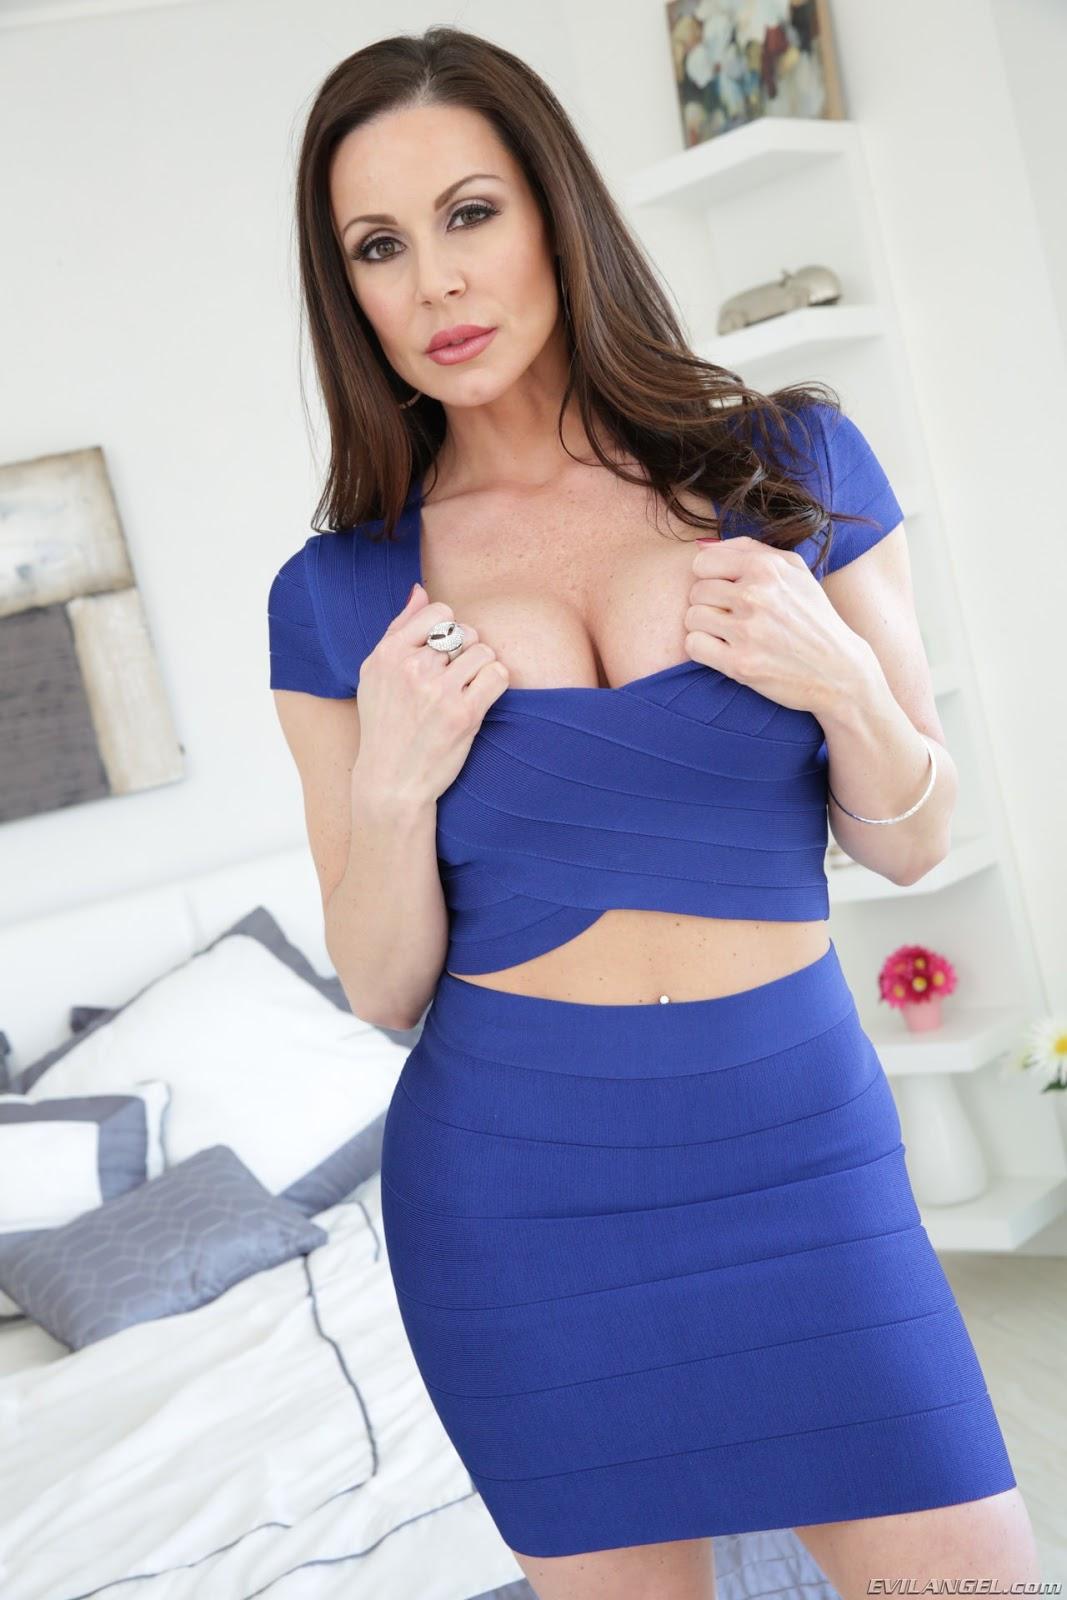 Watch Kendra Lust video